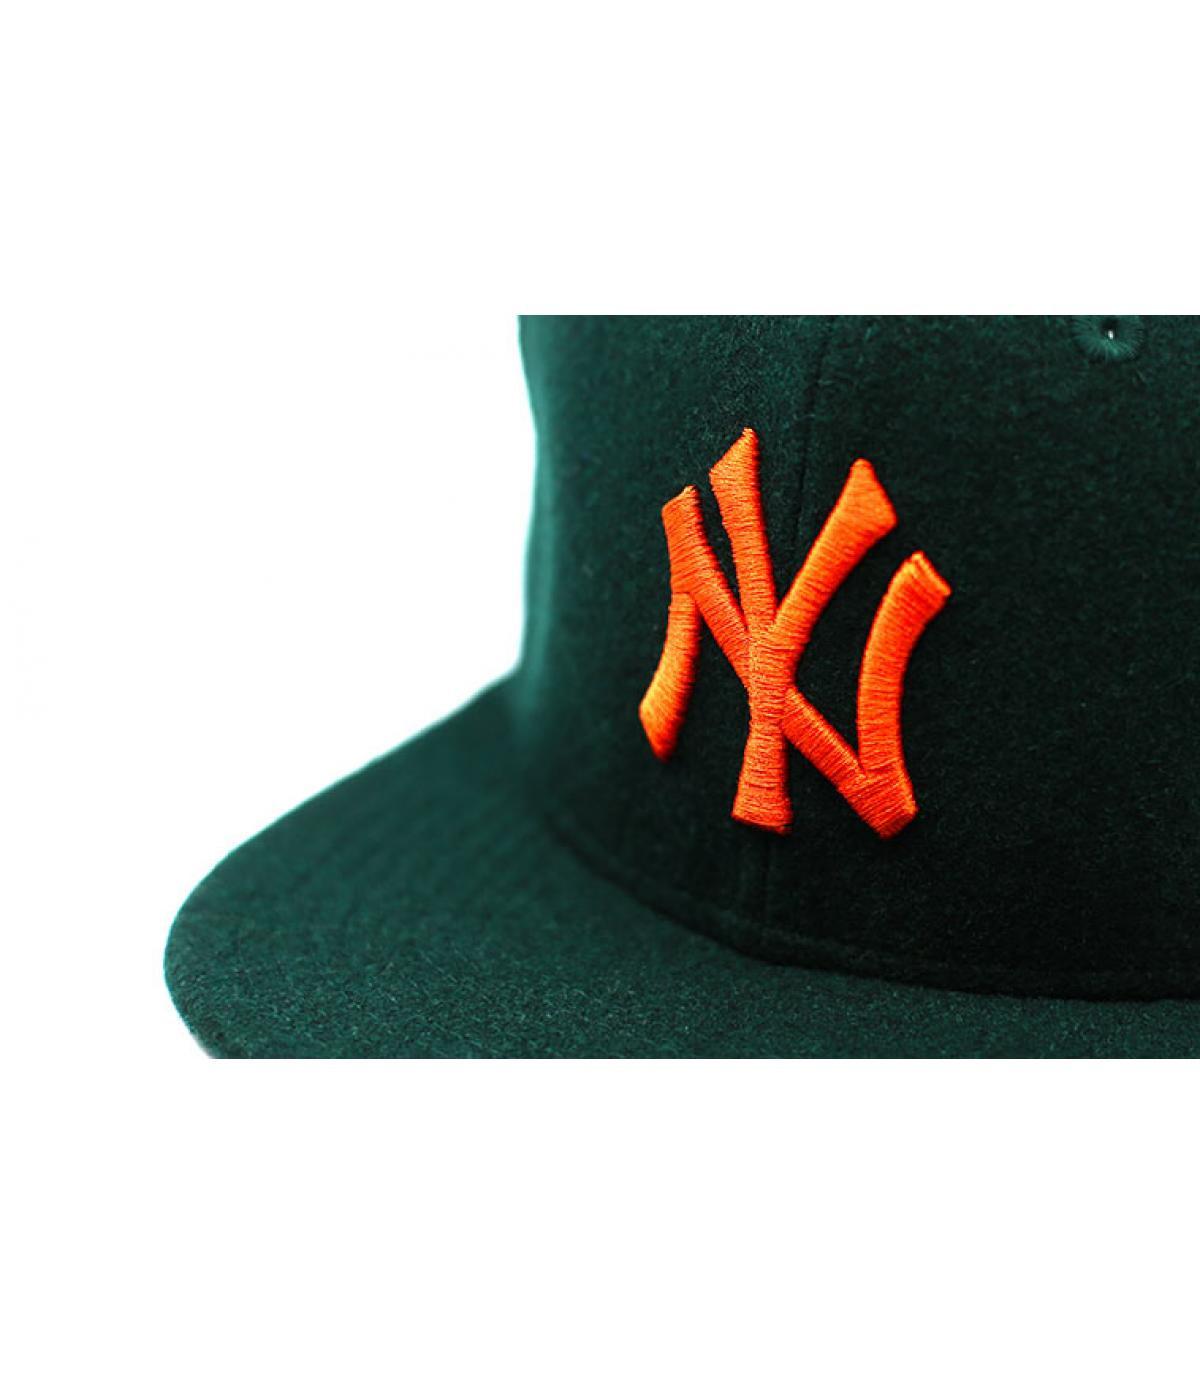 Details Winter Utility NY Melton 9Fifty dark green orange - afbeeling 3